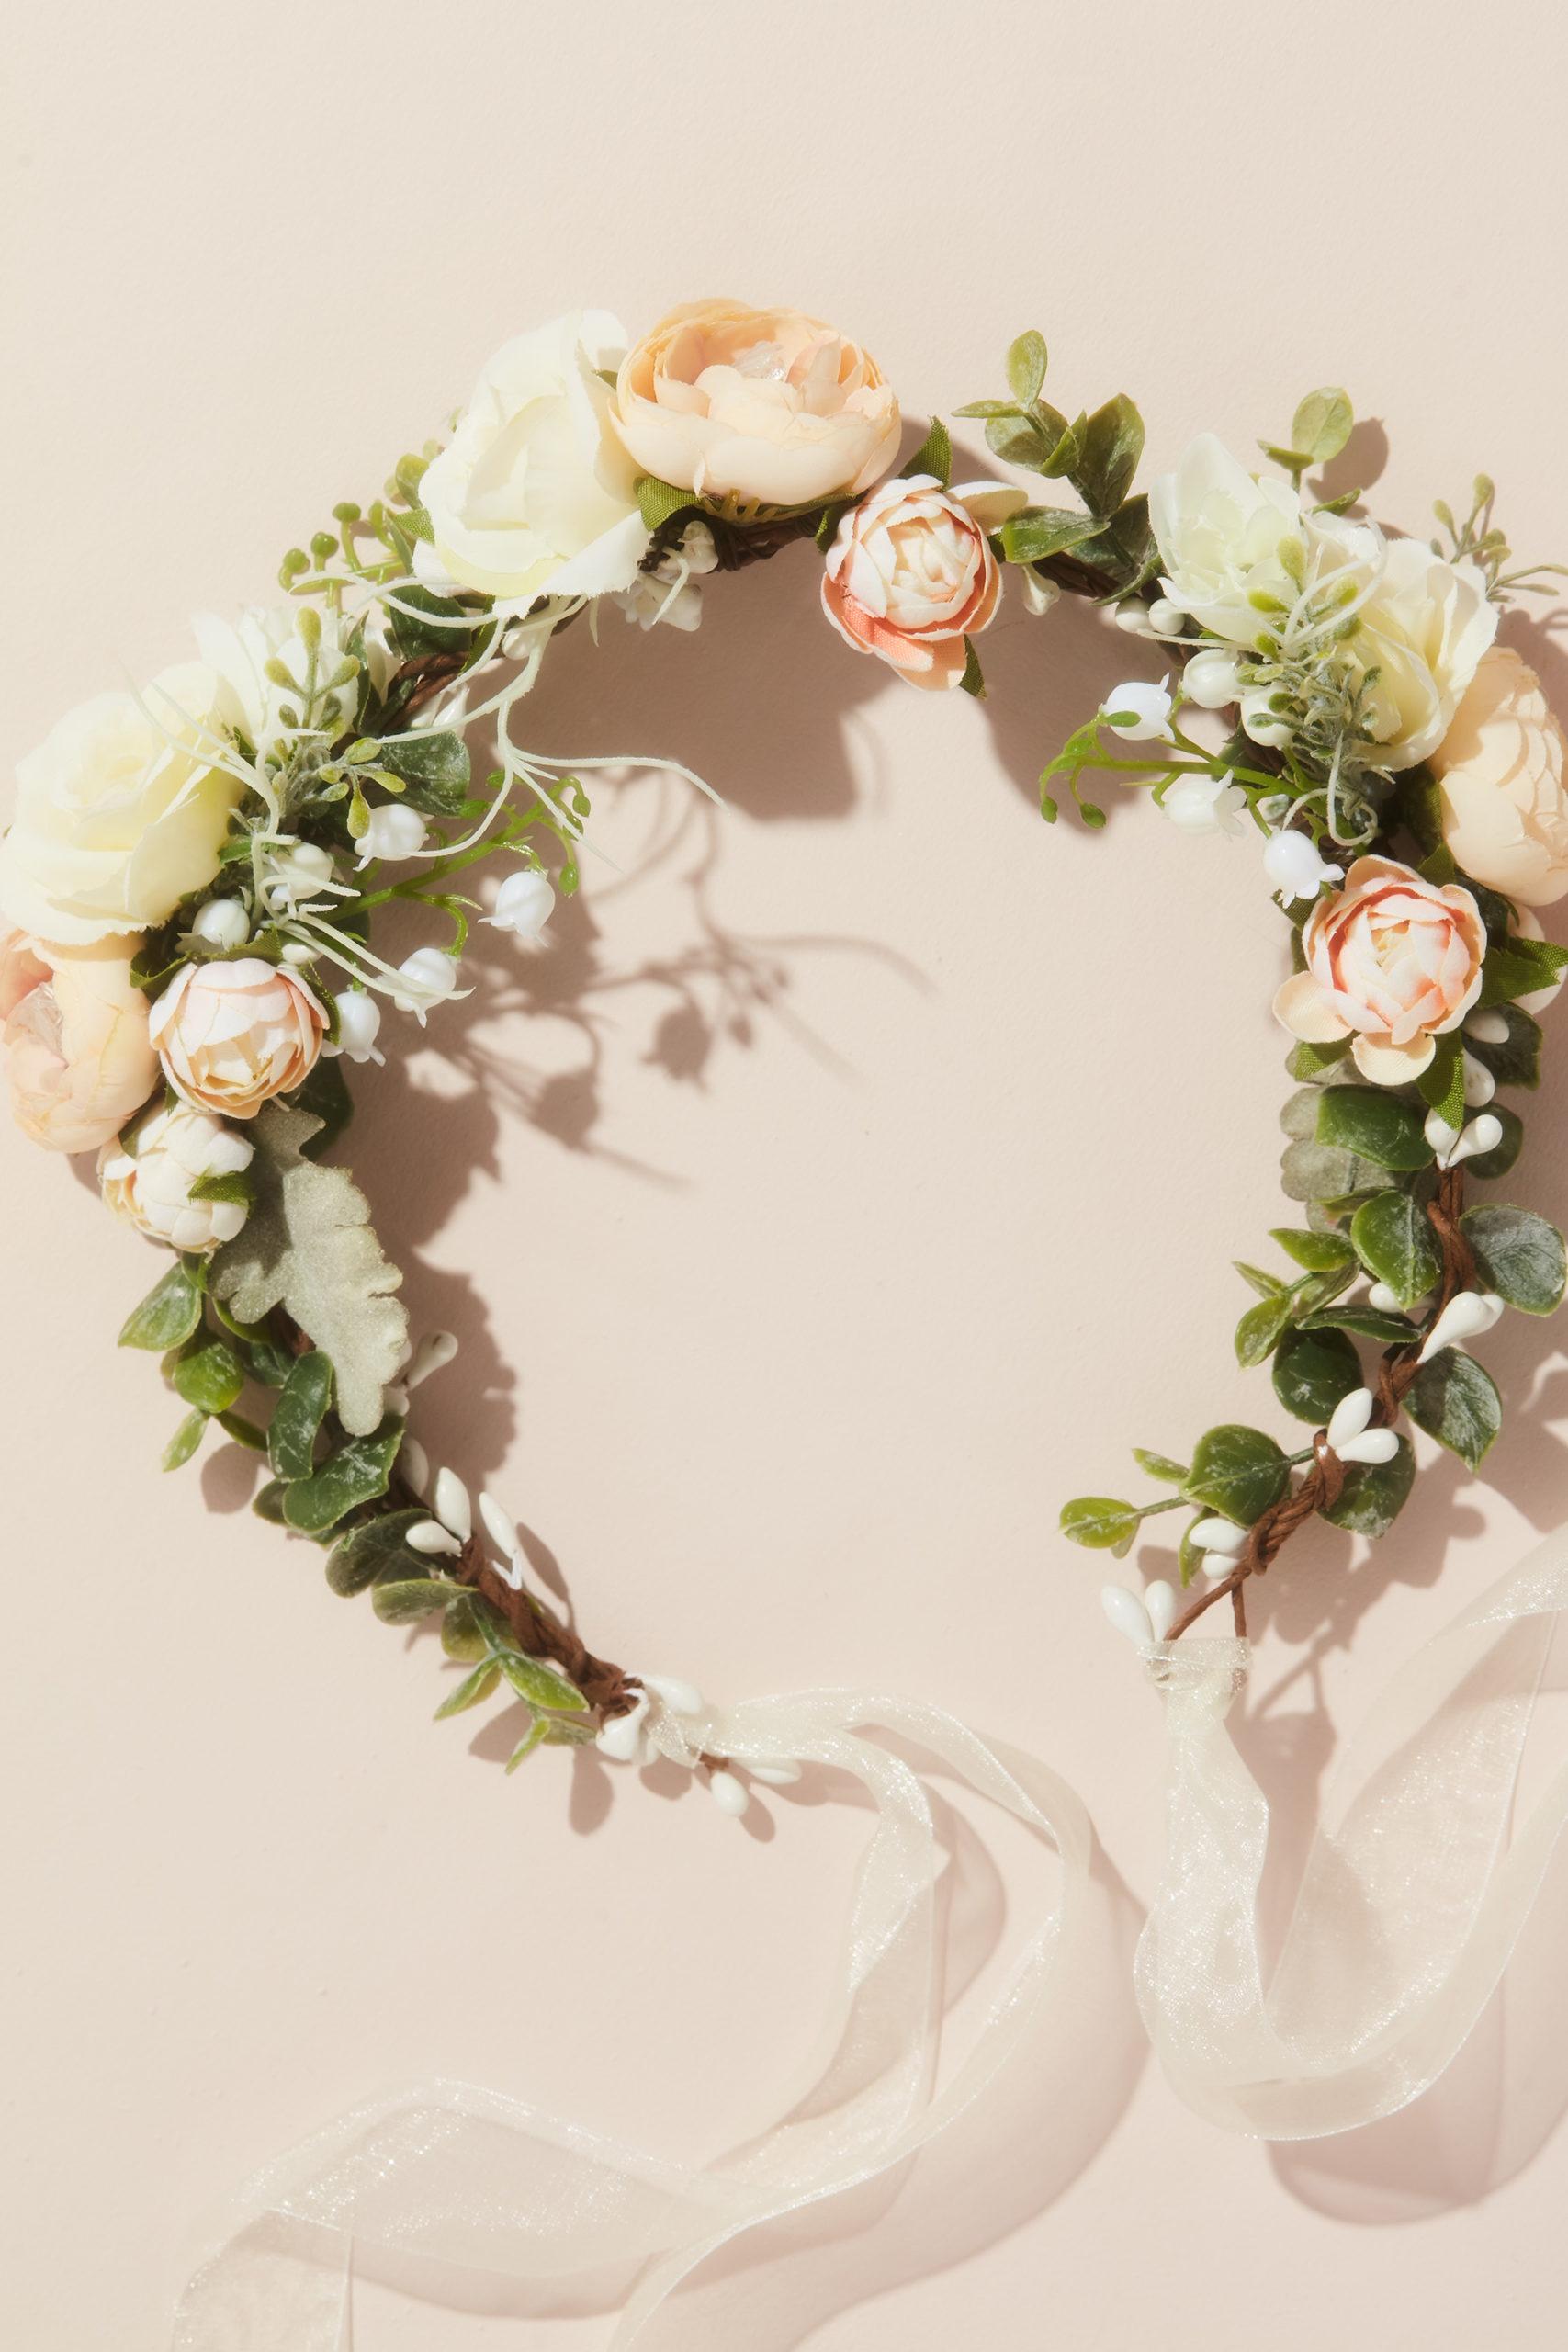 Boho Faux Flower Crown with Organza Ribbon